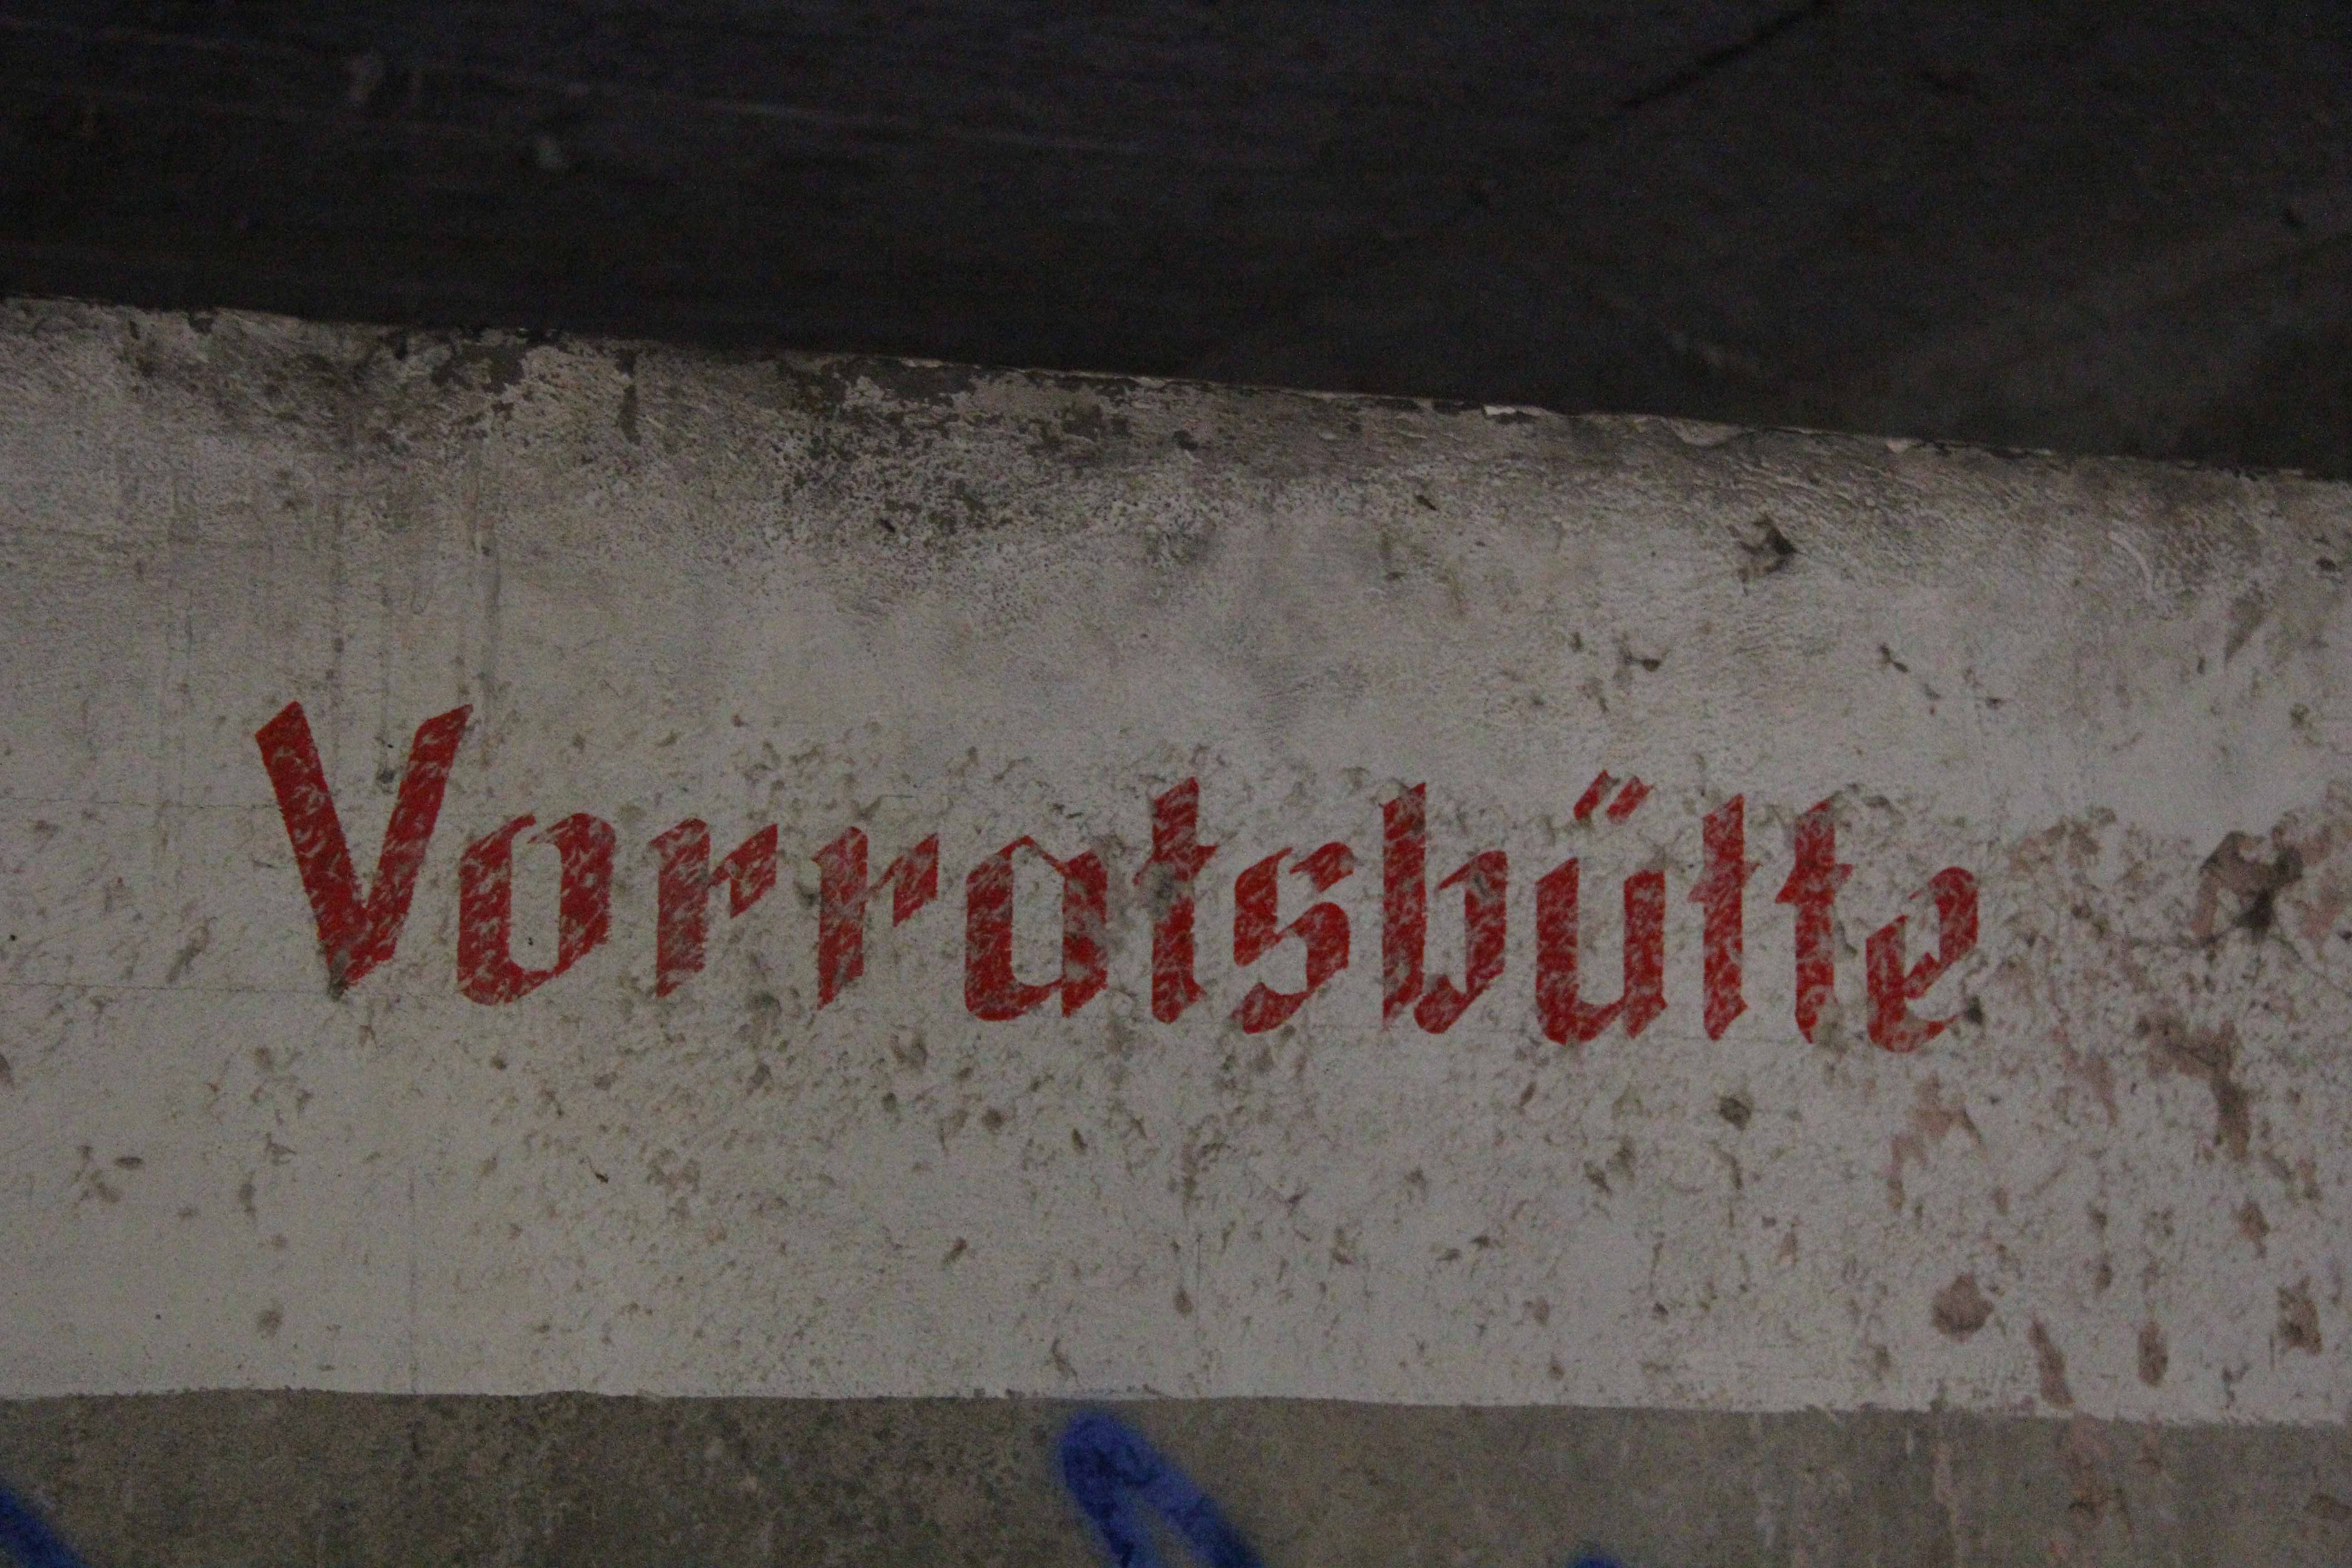 Vorratsbütte (Storage chest) at Papierfabrik Wolfswinkel, an abandoned paper mill near Berlin